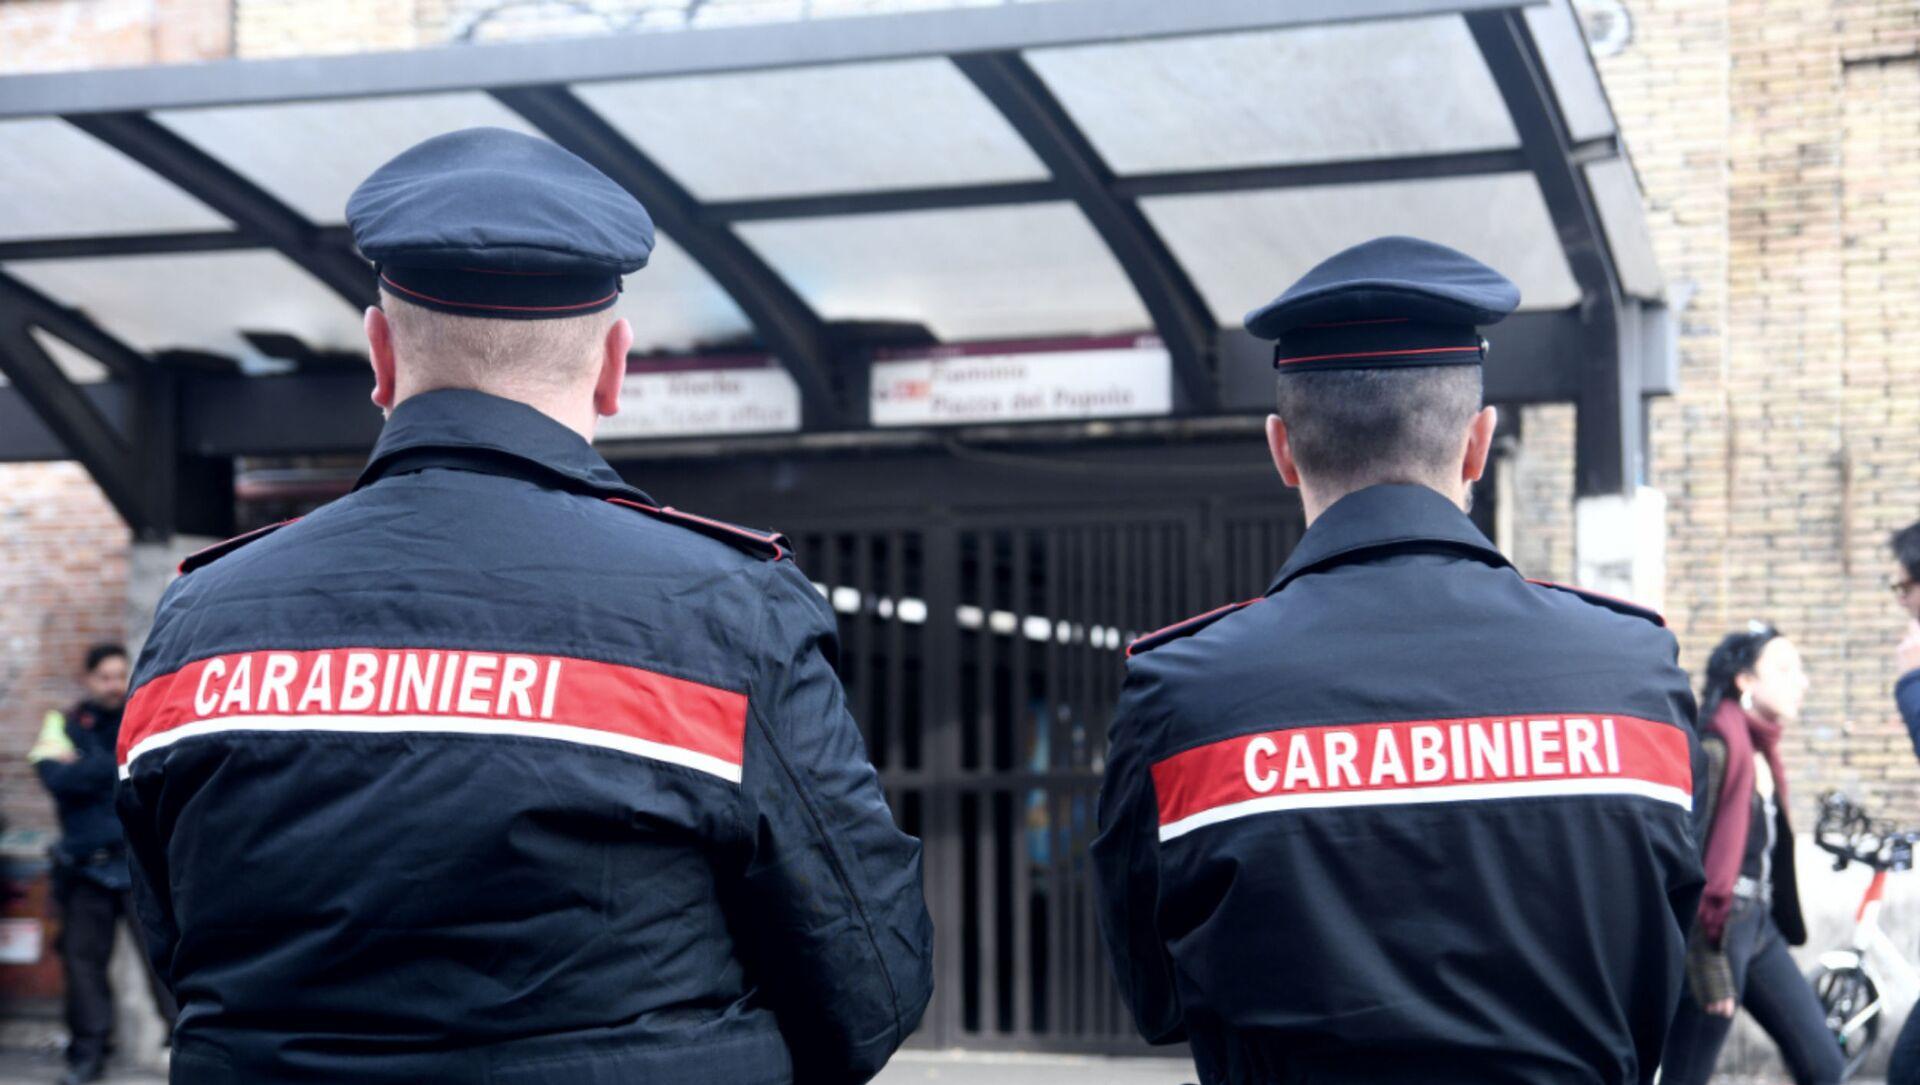 I carabinieri  - Sputnik Italia, 1920, 02.04.2021